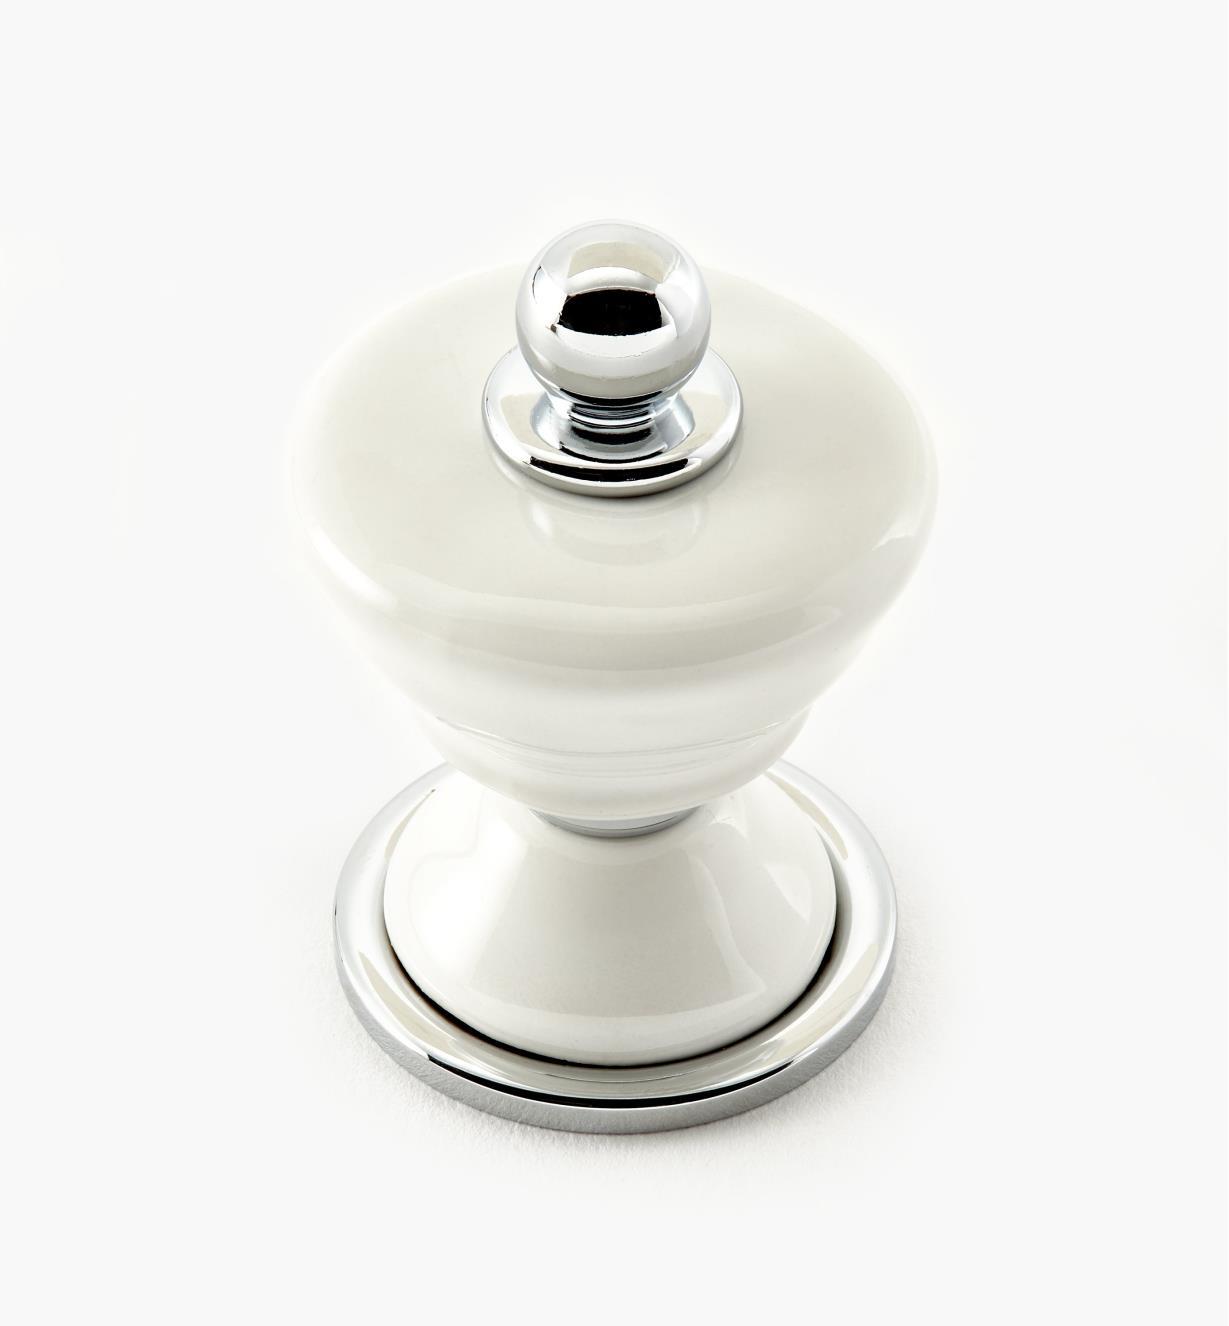 99W9651 - Chrome Brainerd Ceramic Alexandria Knobs, each